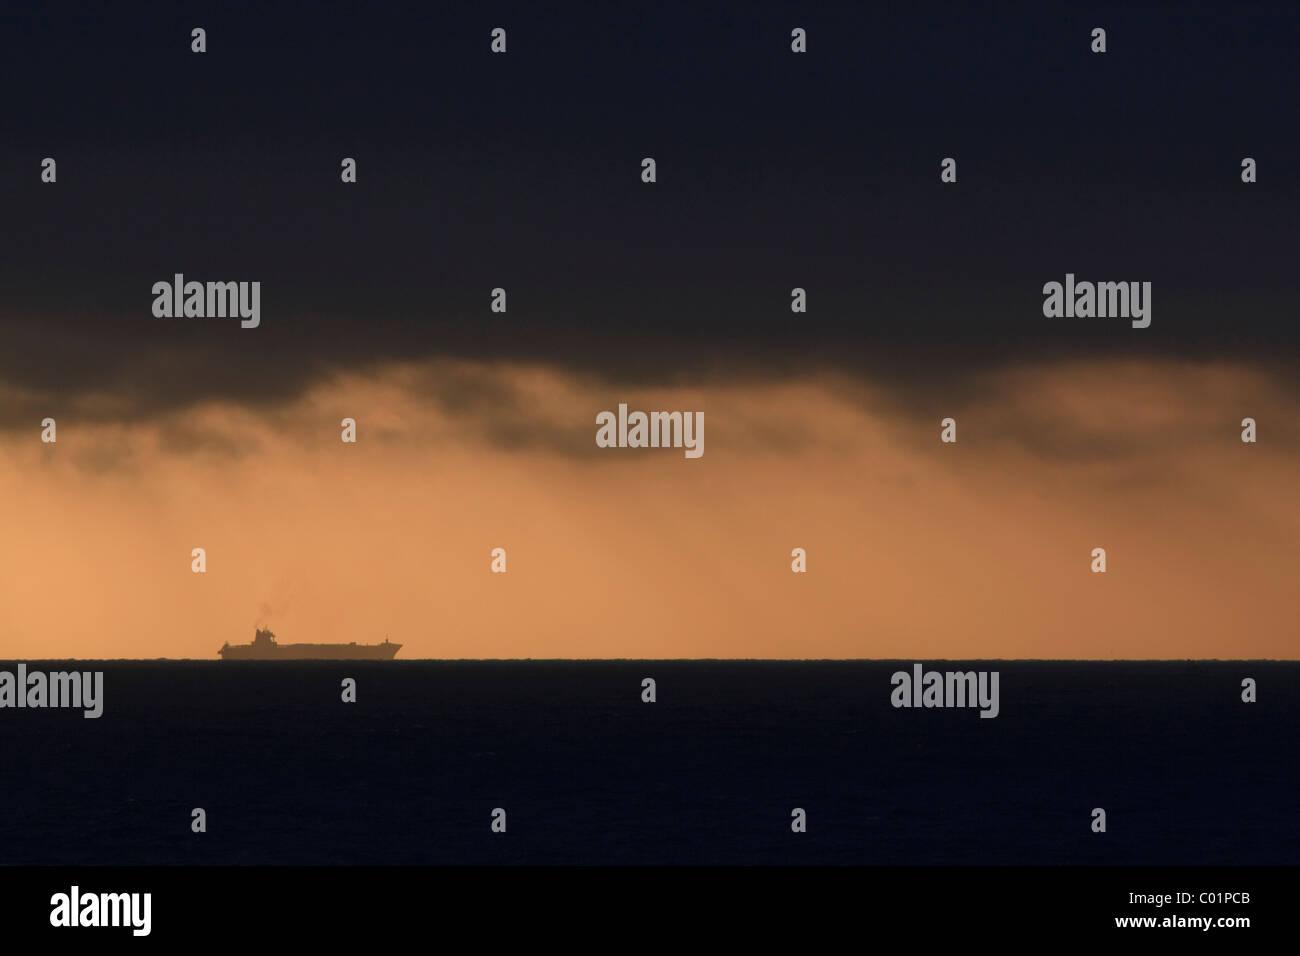 Large container ship on the darkened horizon at sunset, Hirtshals, Denmark, Scandinavia, Europe - Stock Image